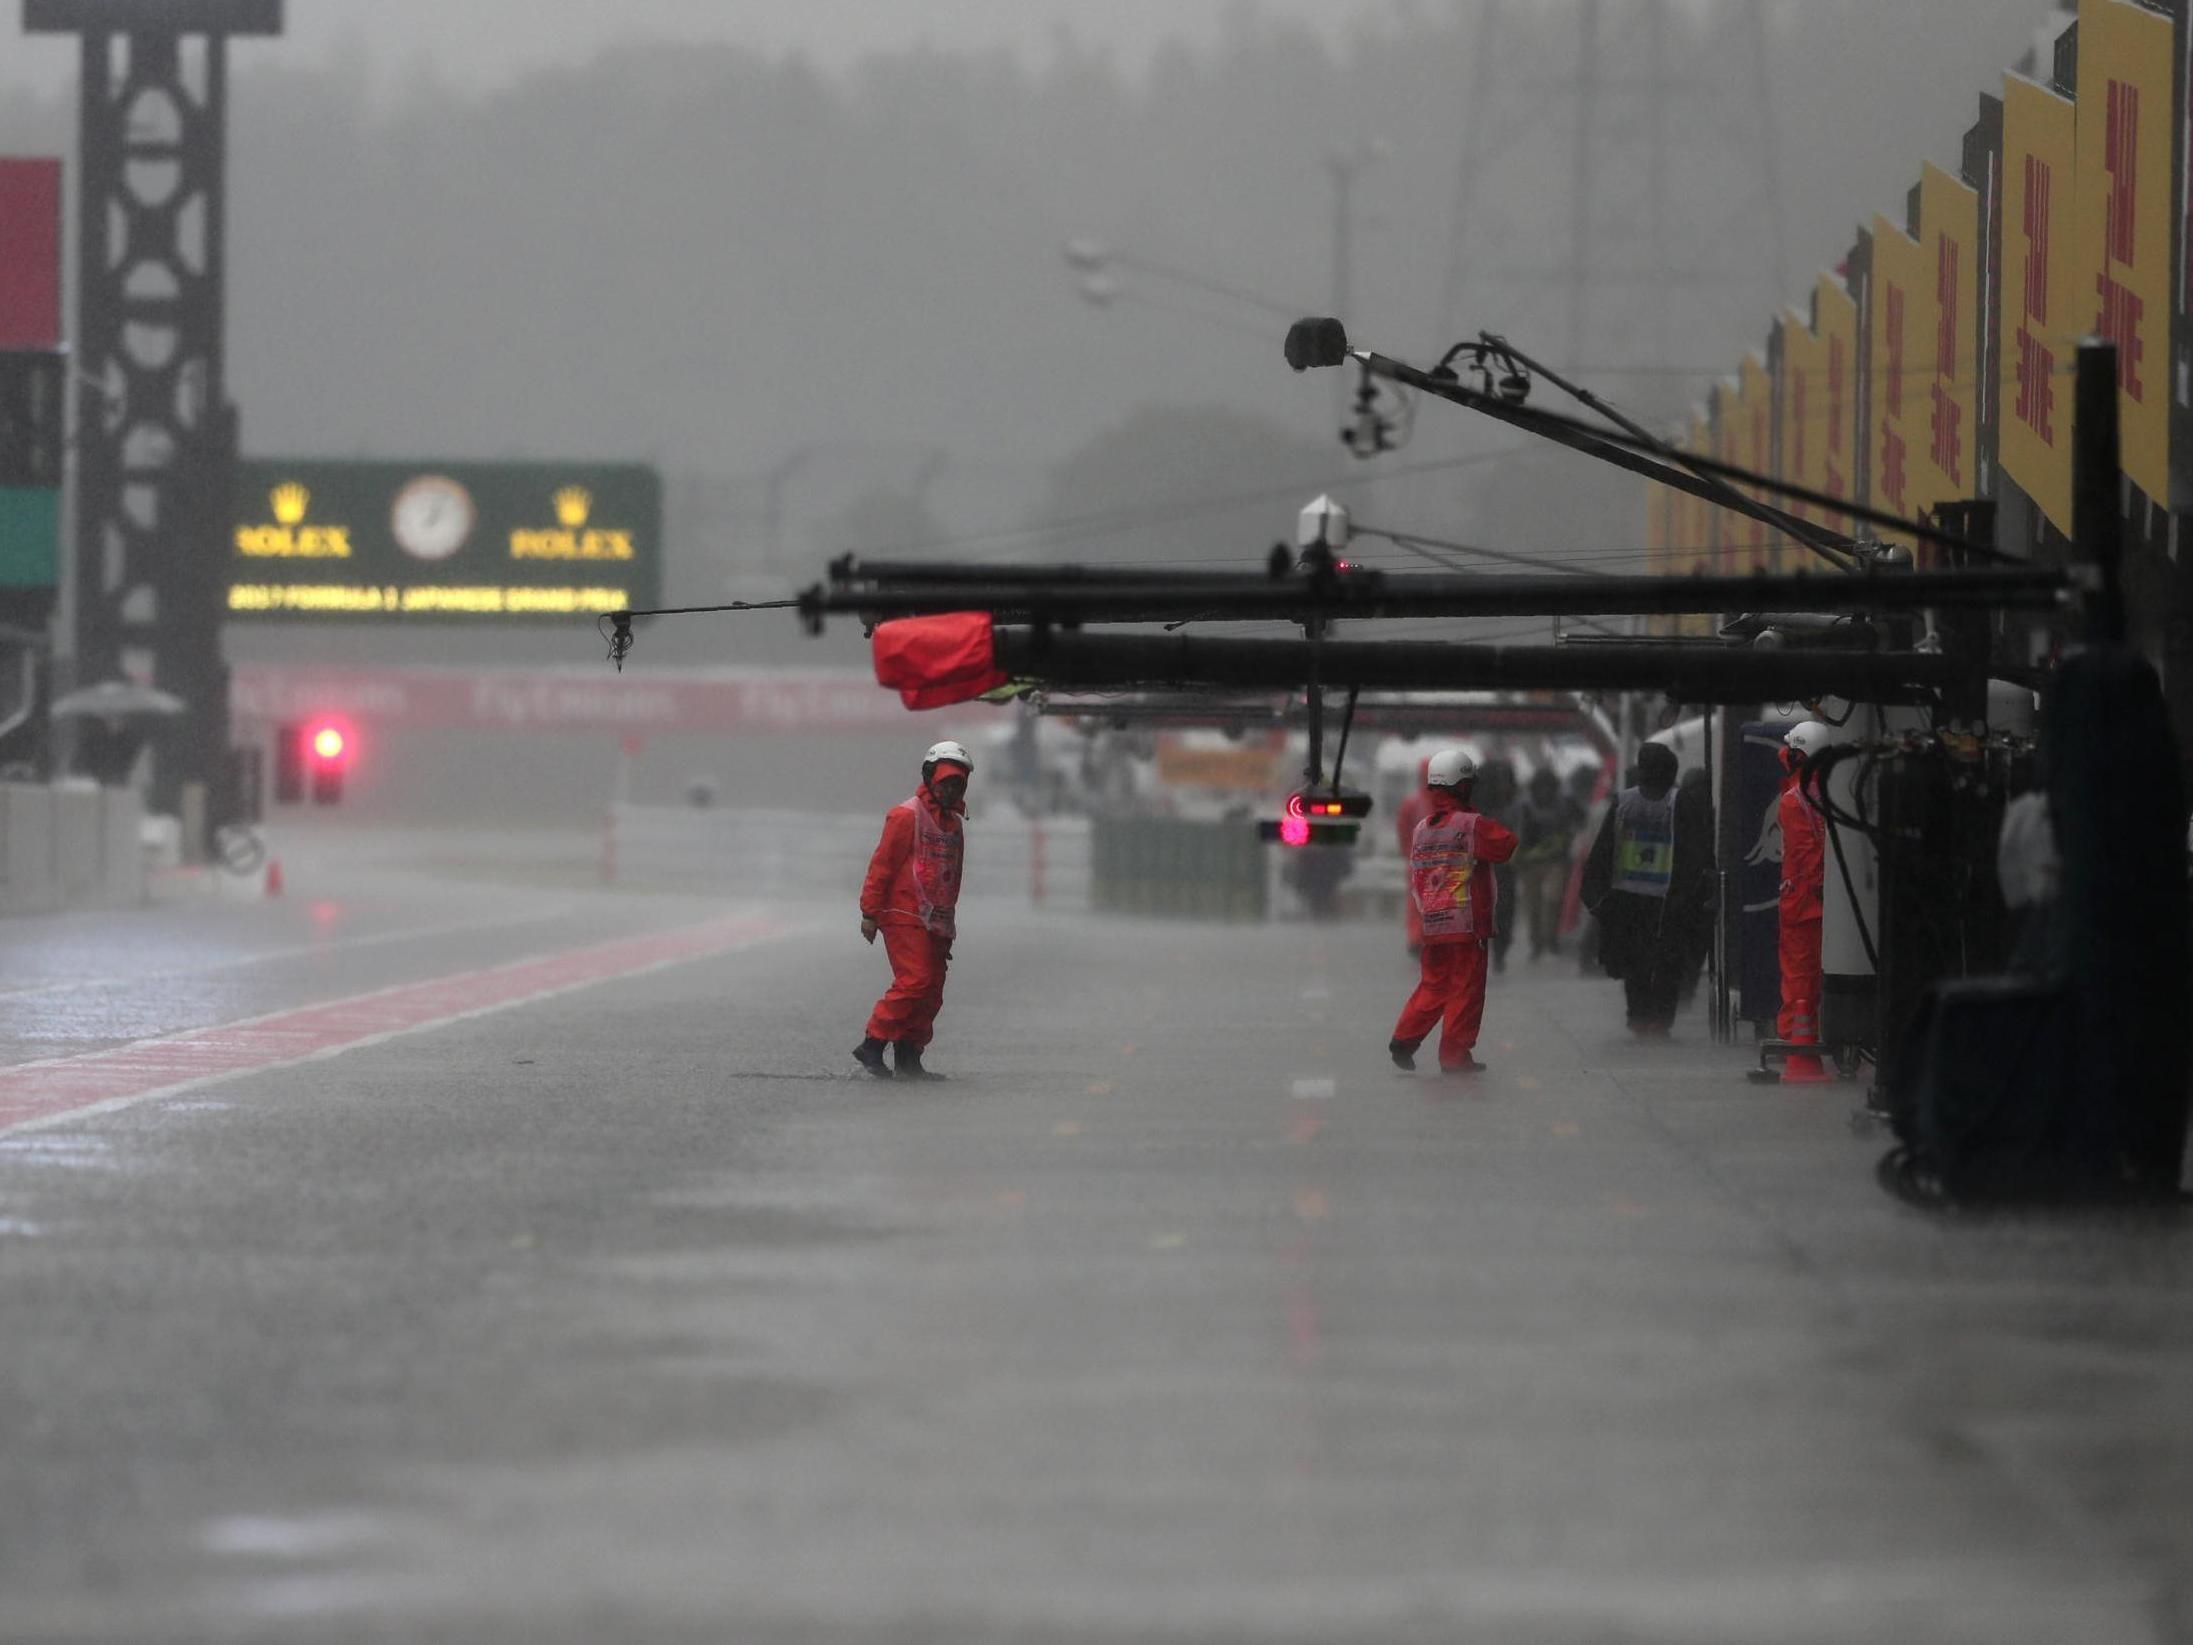 Japanese Grand Prix 2019: F1 bosses hopeful race will go ahead despite Typhoon Hagibis